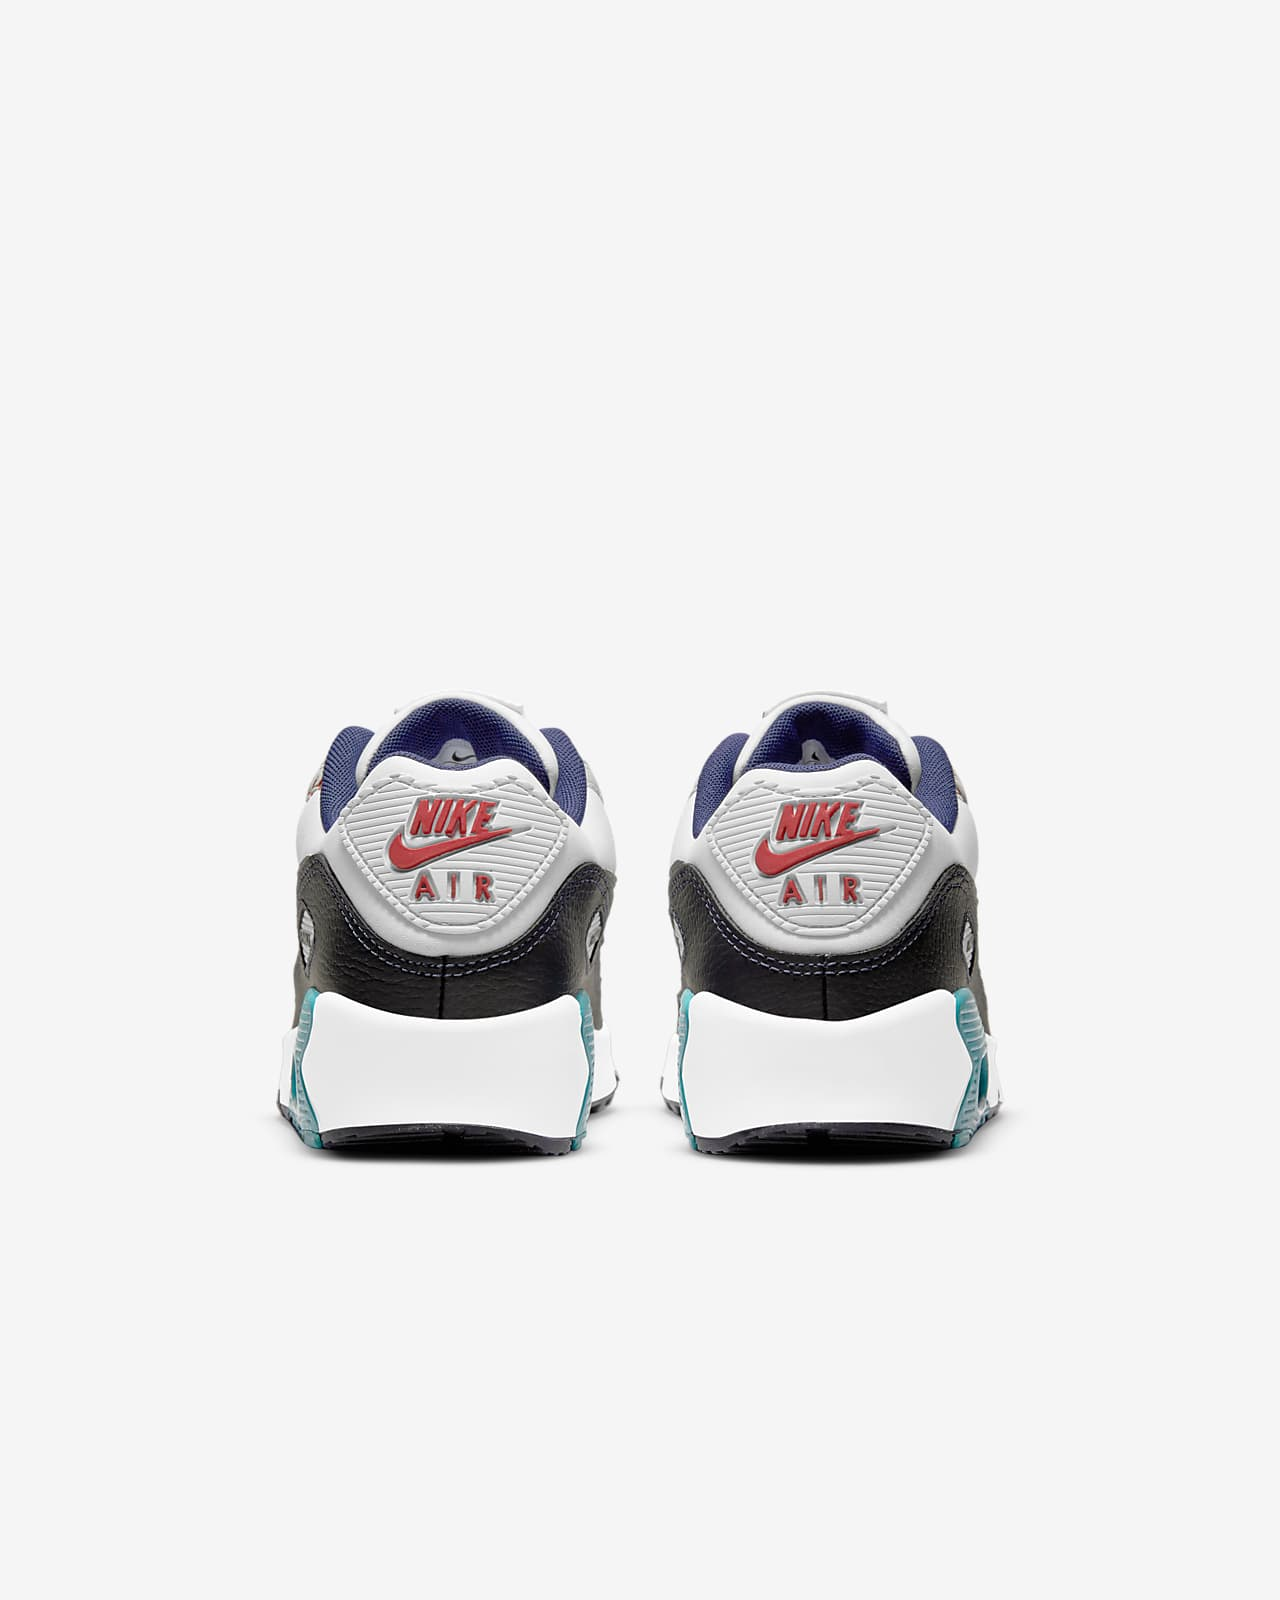 Nike Air Max 90 Big Kids' Shoes